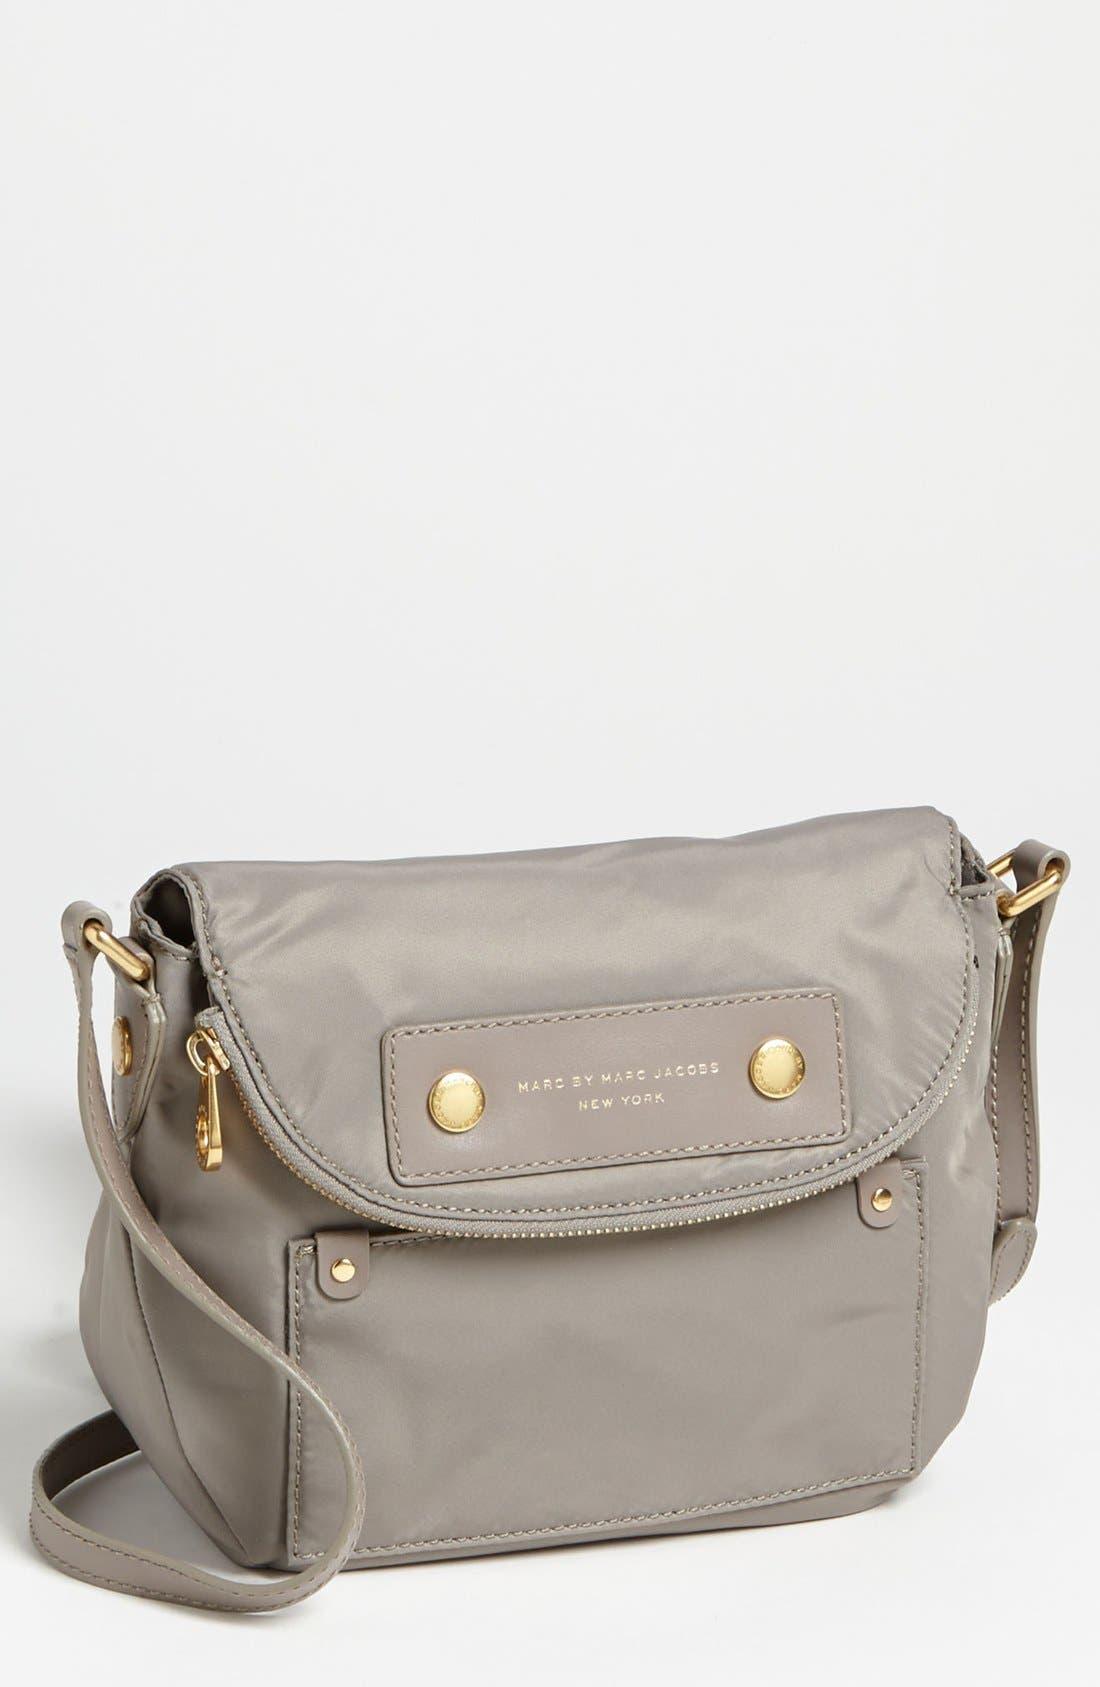 Alternate Image 1 Selected - MARC BY MARC JACOBS 'Pretty Nylon Natasha - Mini' Crossbody Bag